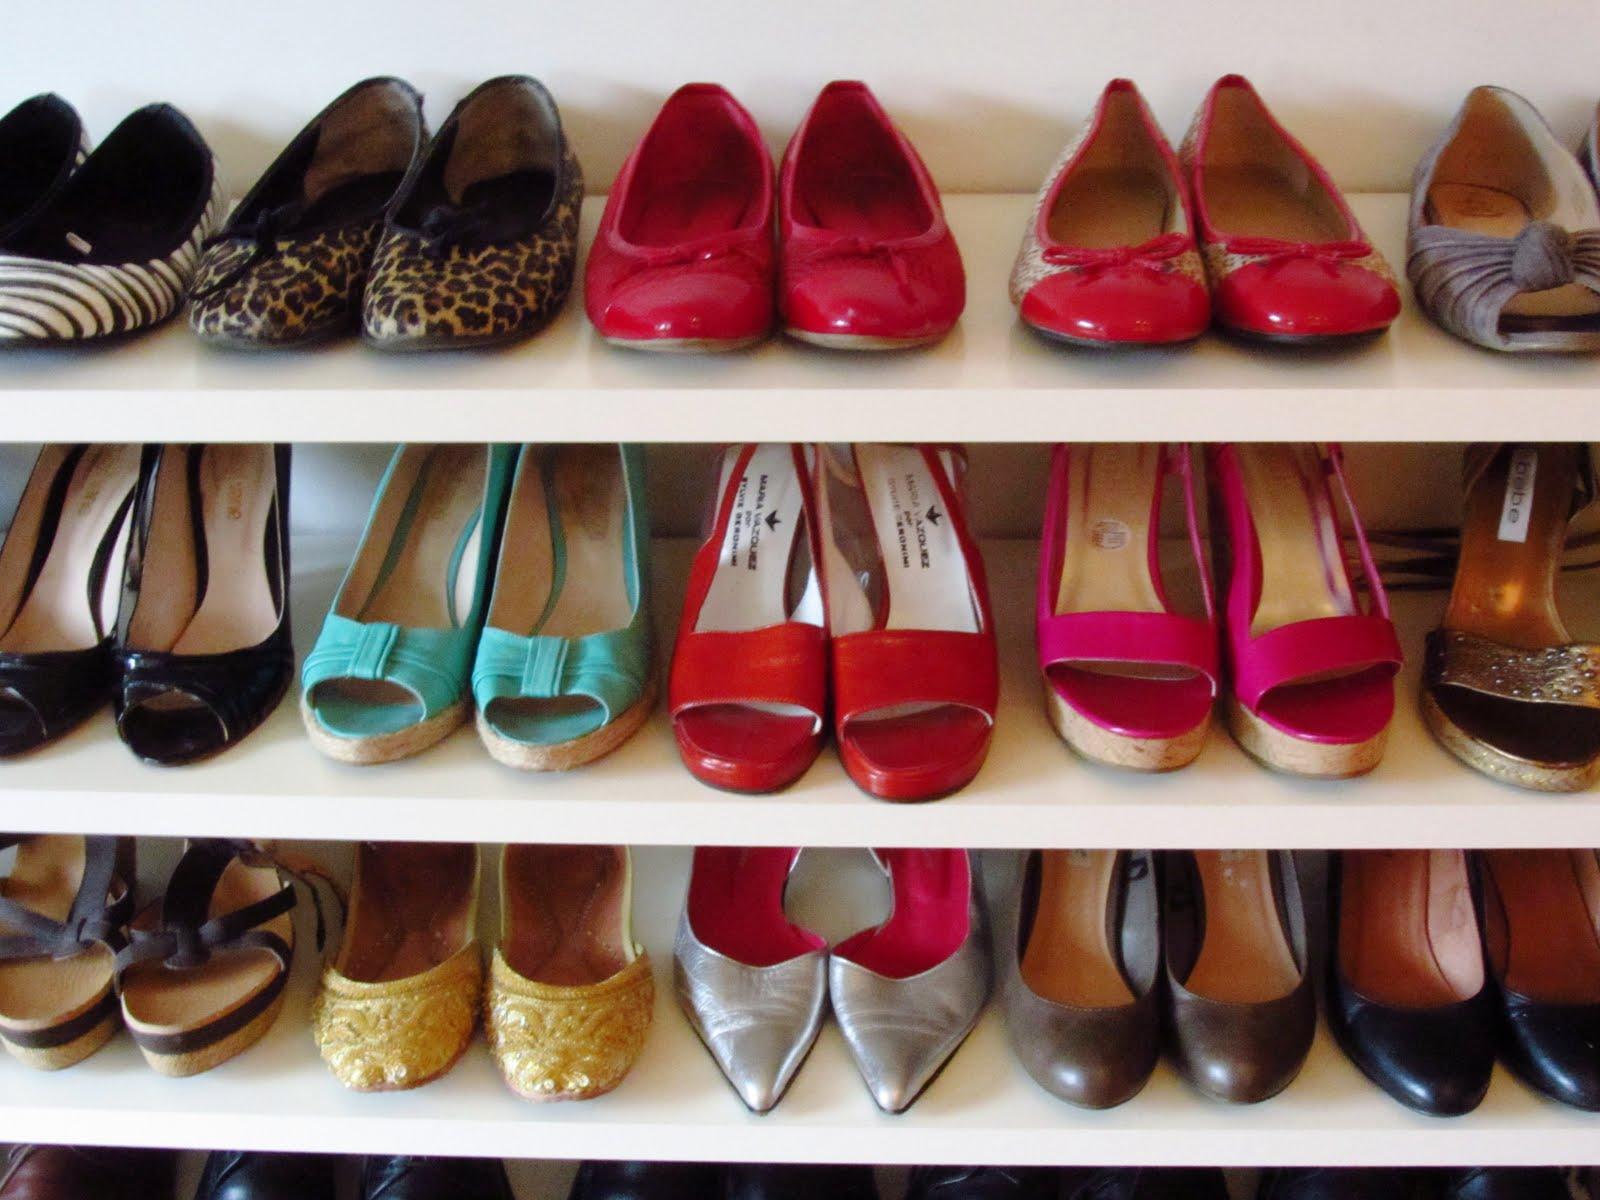 Moda como ordenar tu closet y sacarle provecho a tu ropa - Como guardar zapatos ...